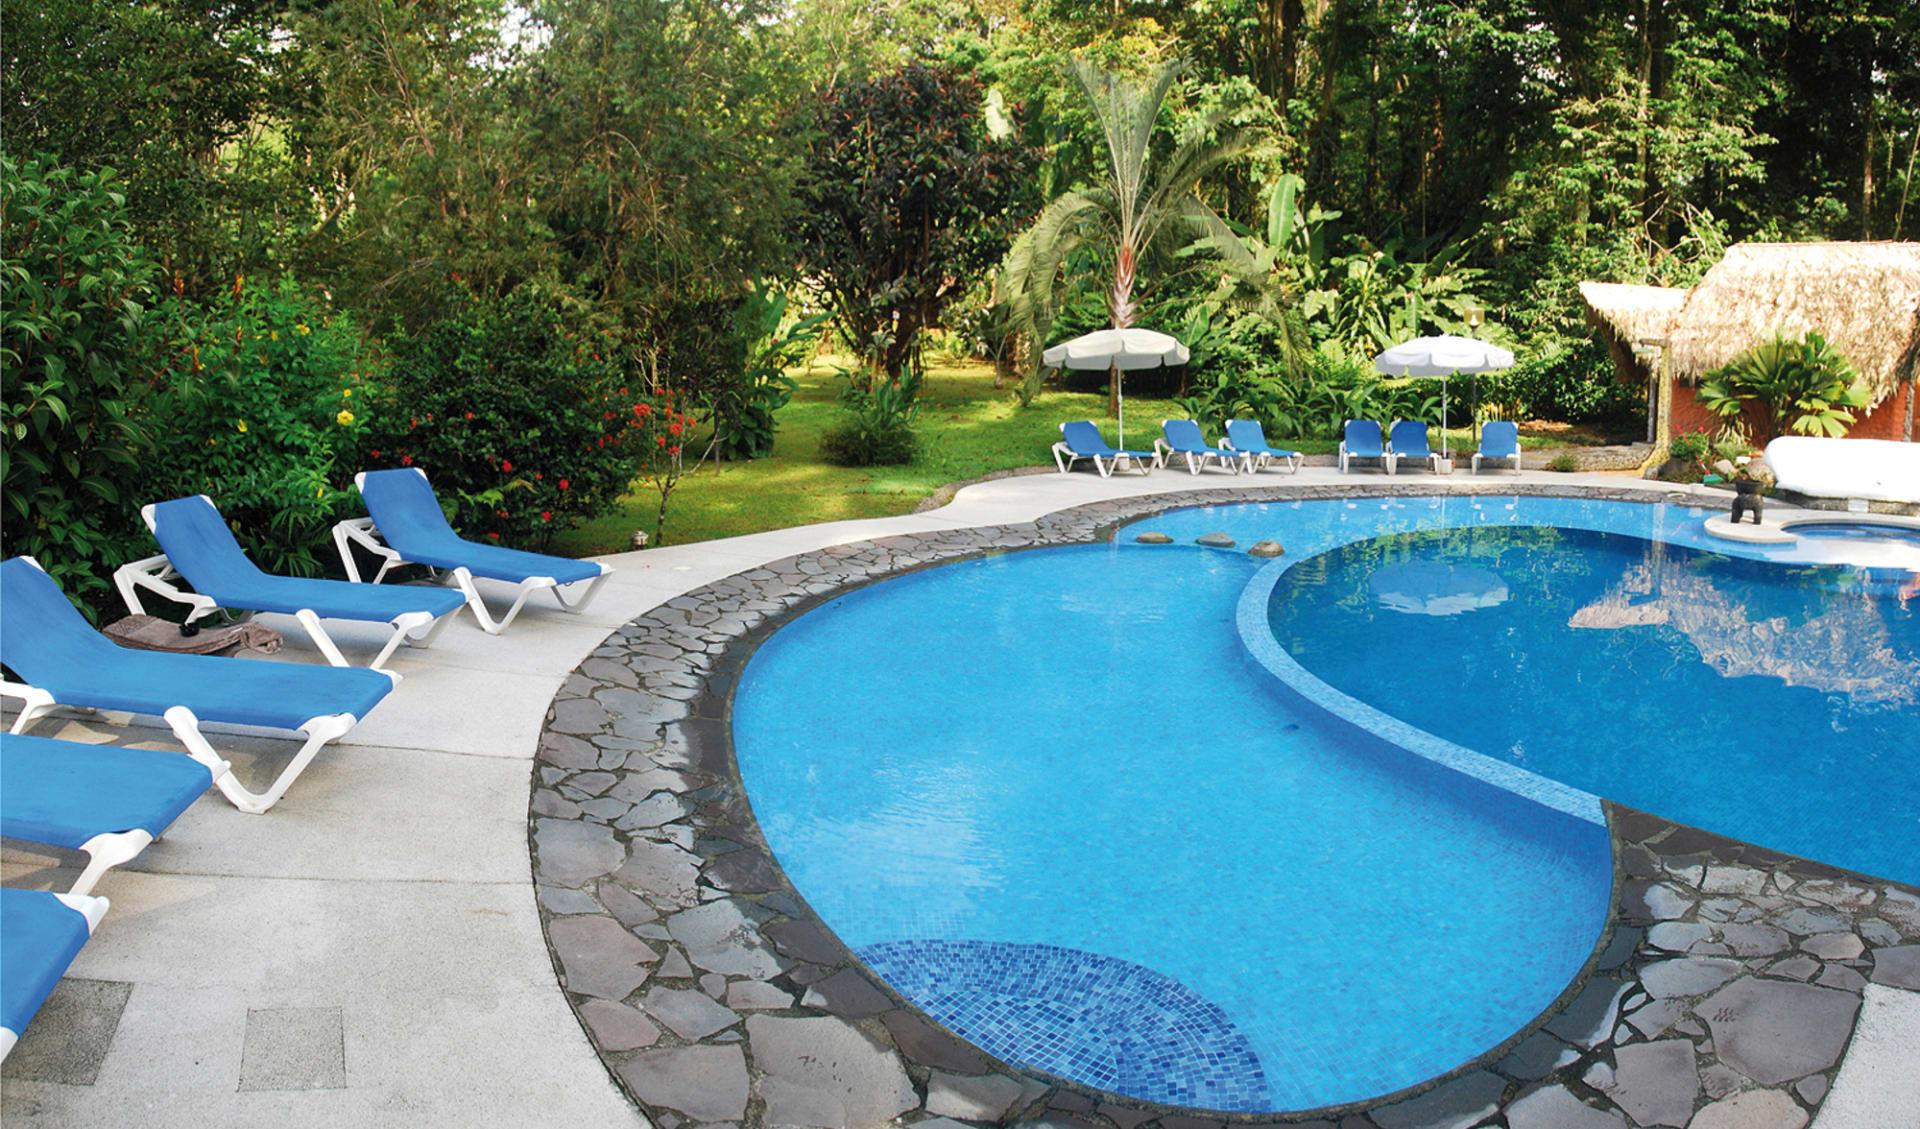 Cariblue Beach & Jungle Resort in Puerto Viejo:  Cariblue Beach and Jungle Resort - Poolanlage